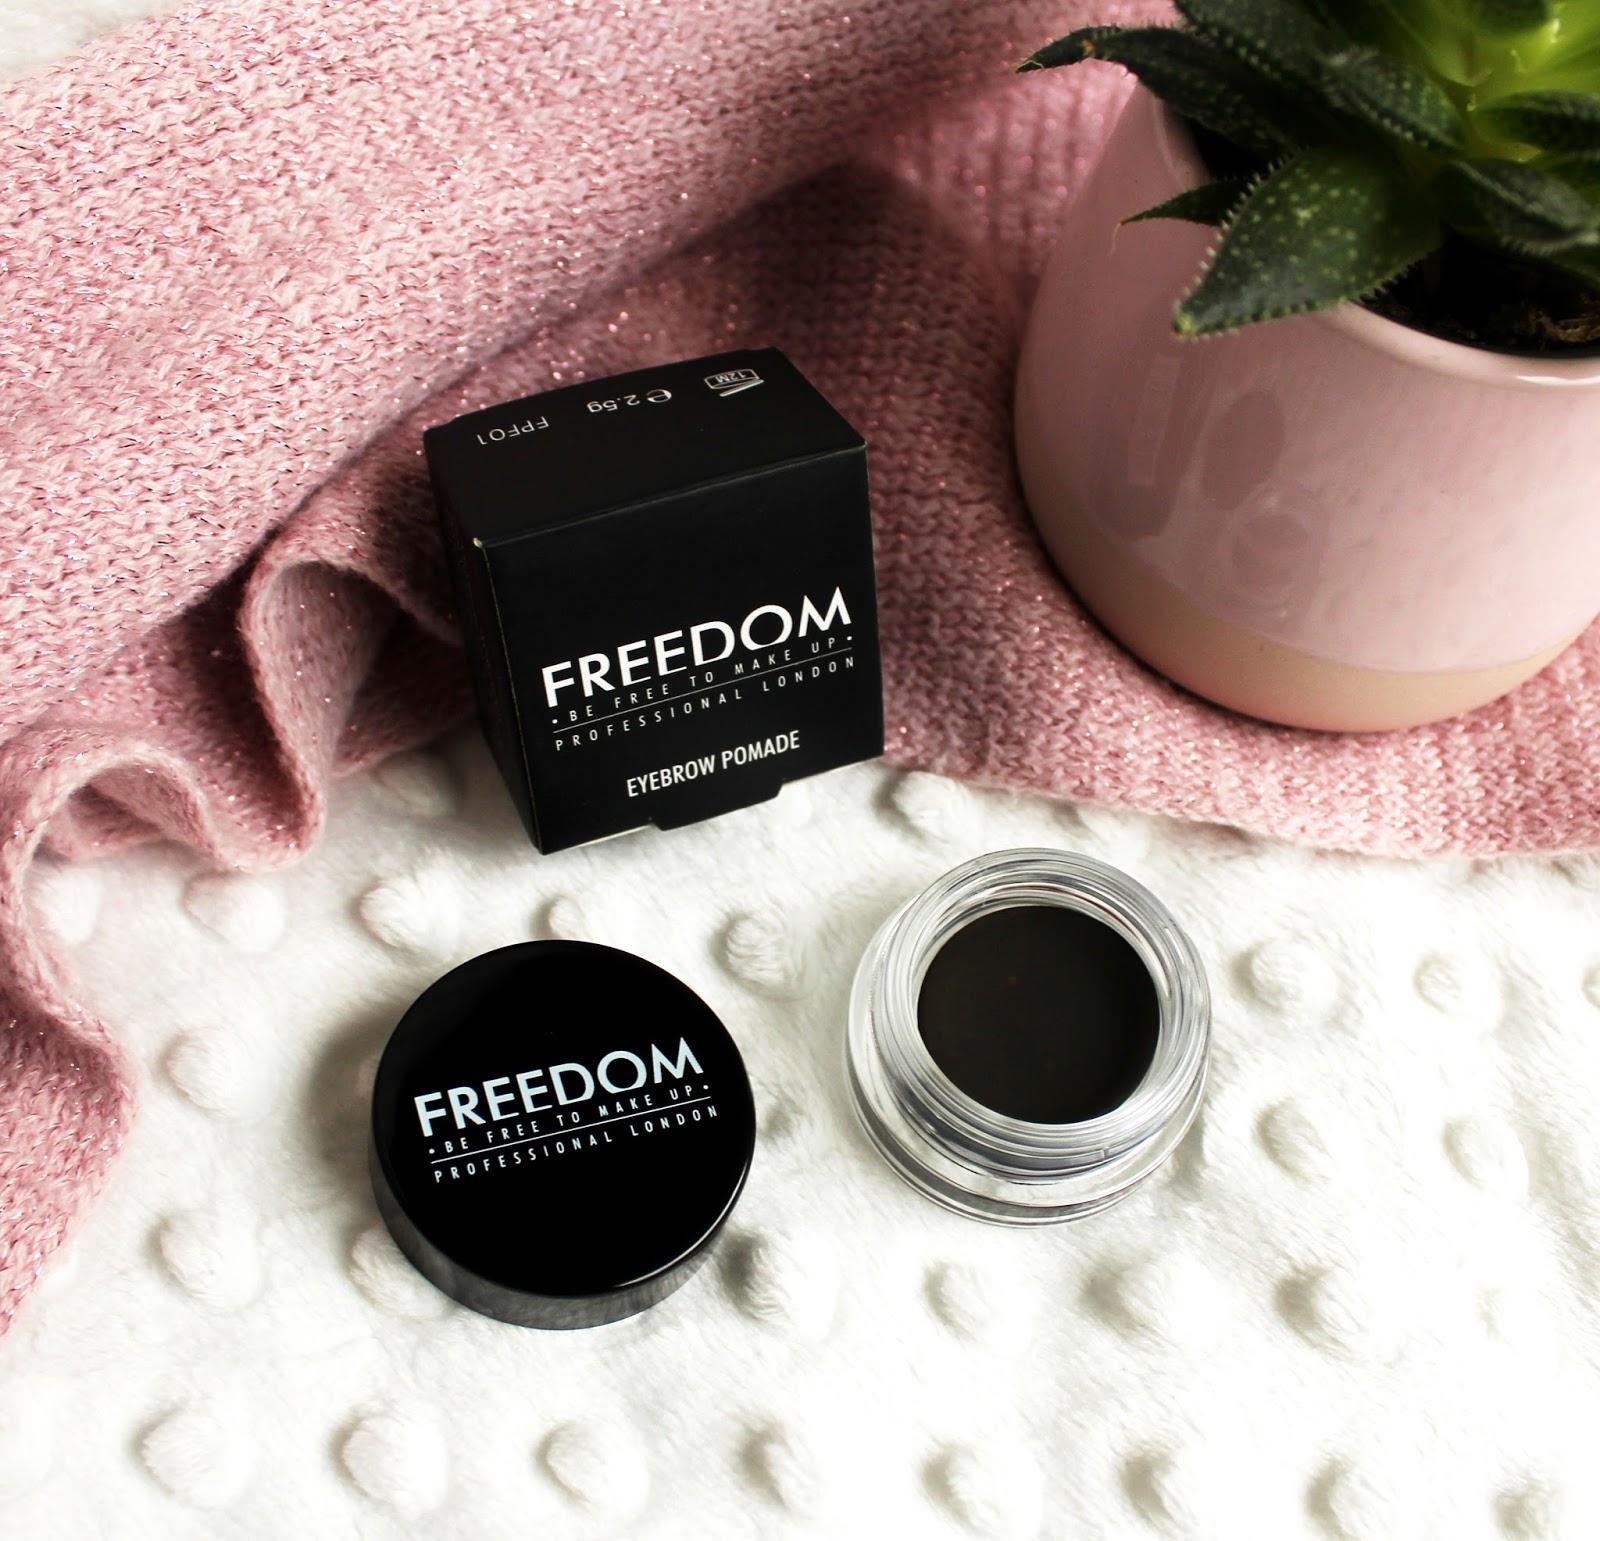 Kolorowka Od Freedom Be Free To Makeup